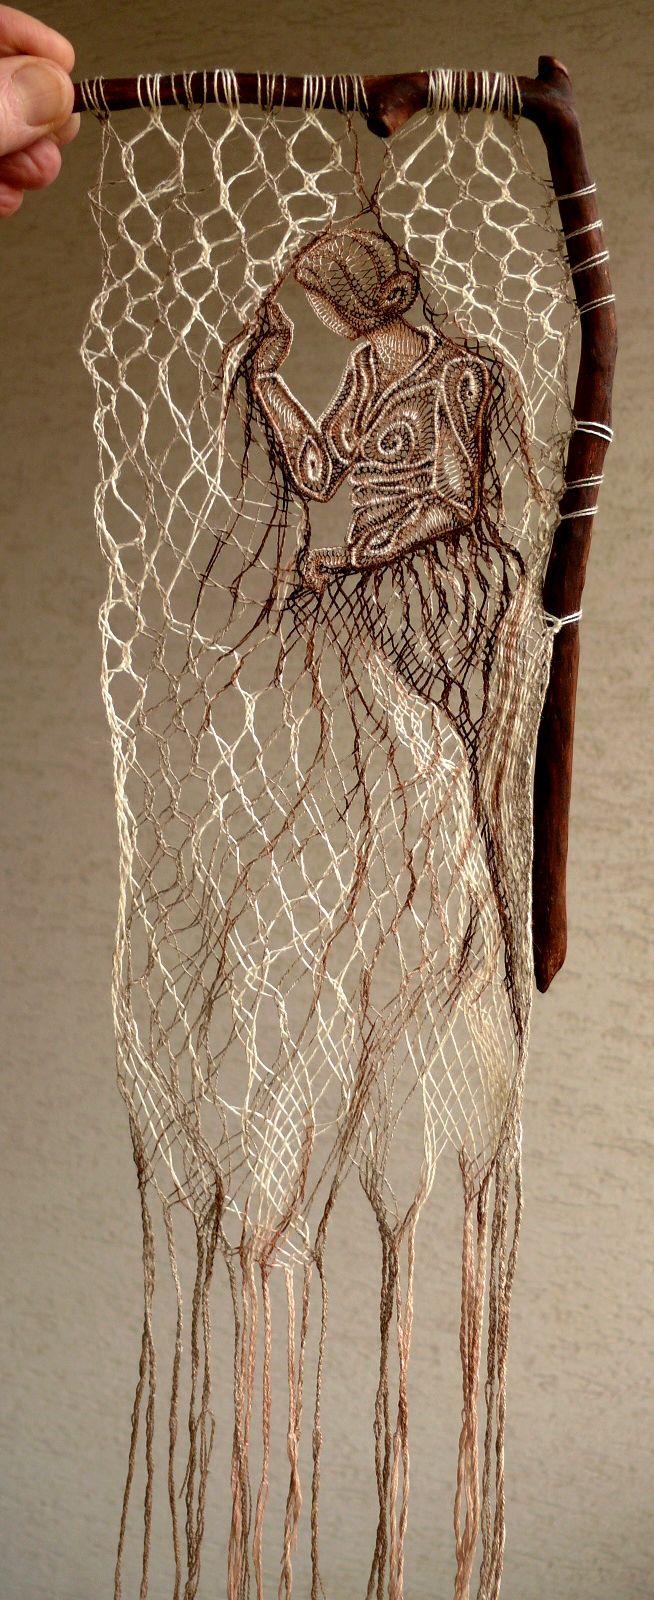 Amazing lace by Ágnes Herczeg